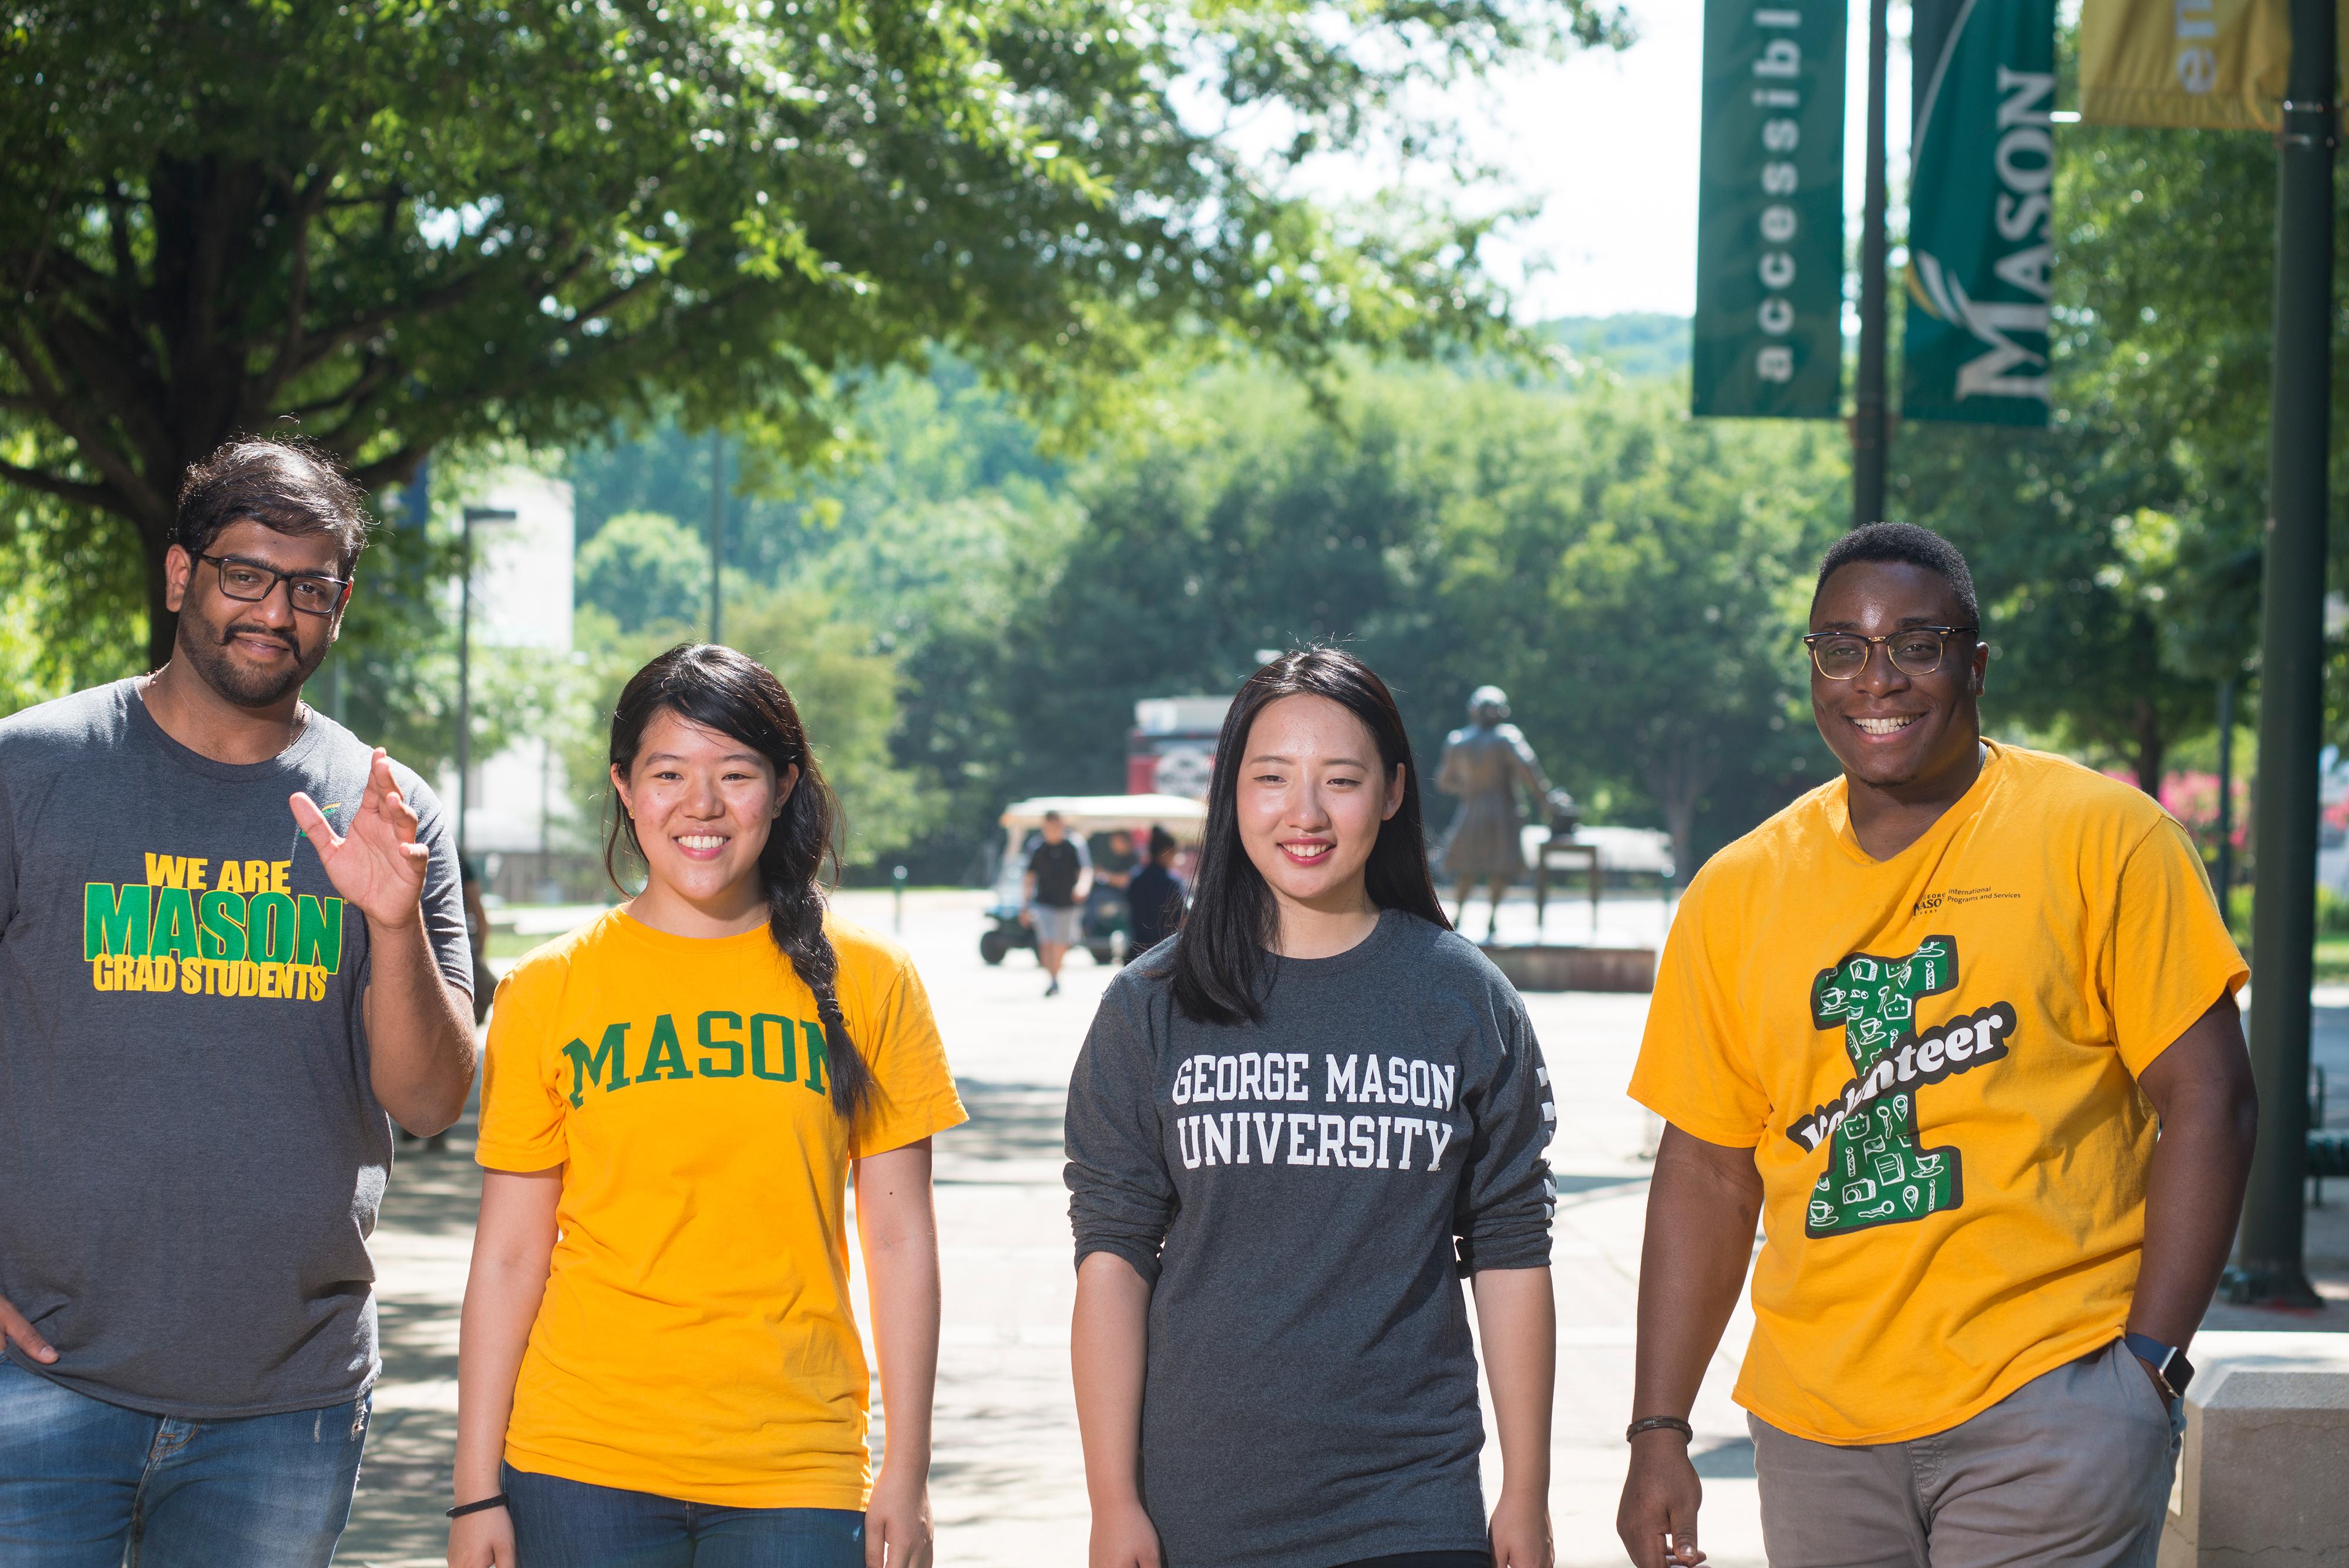 GMU Students walking group